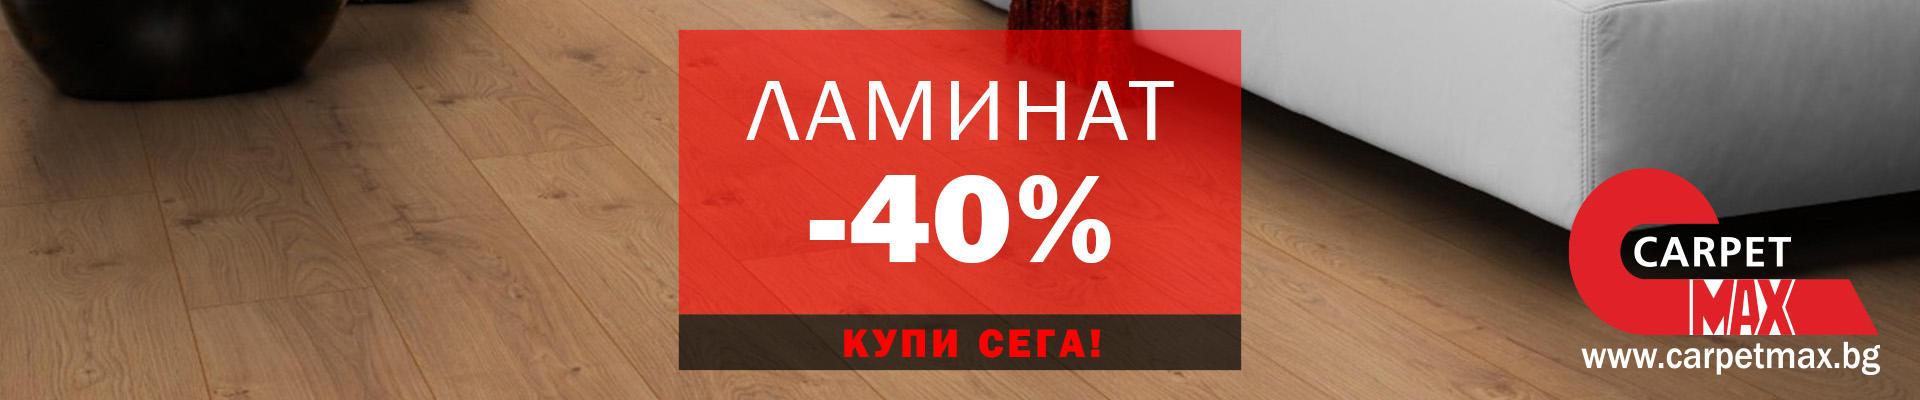 Ламинат -40%